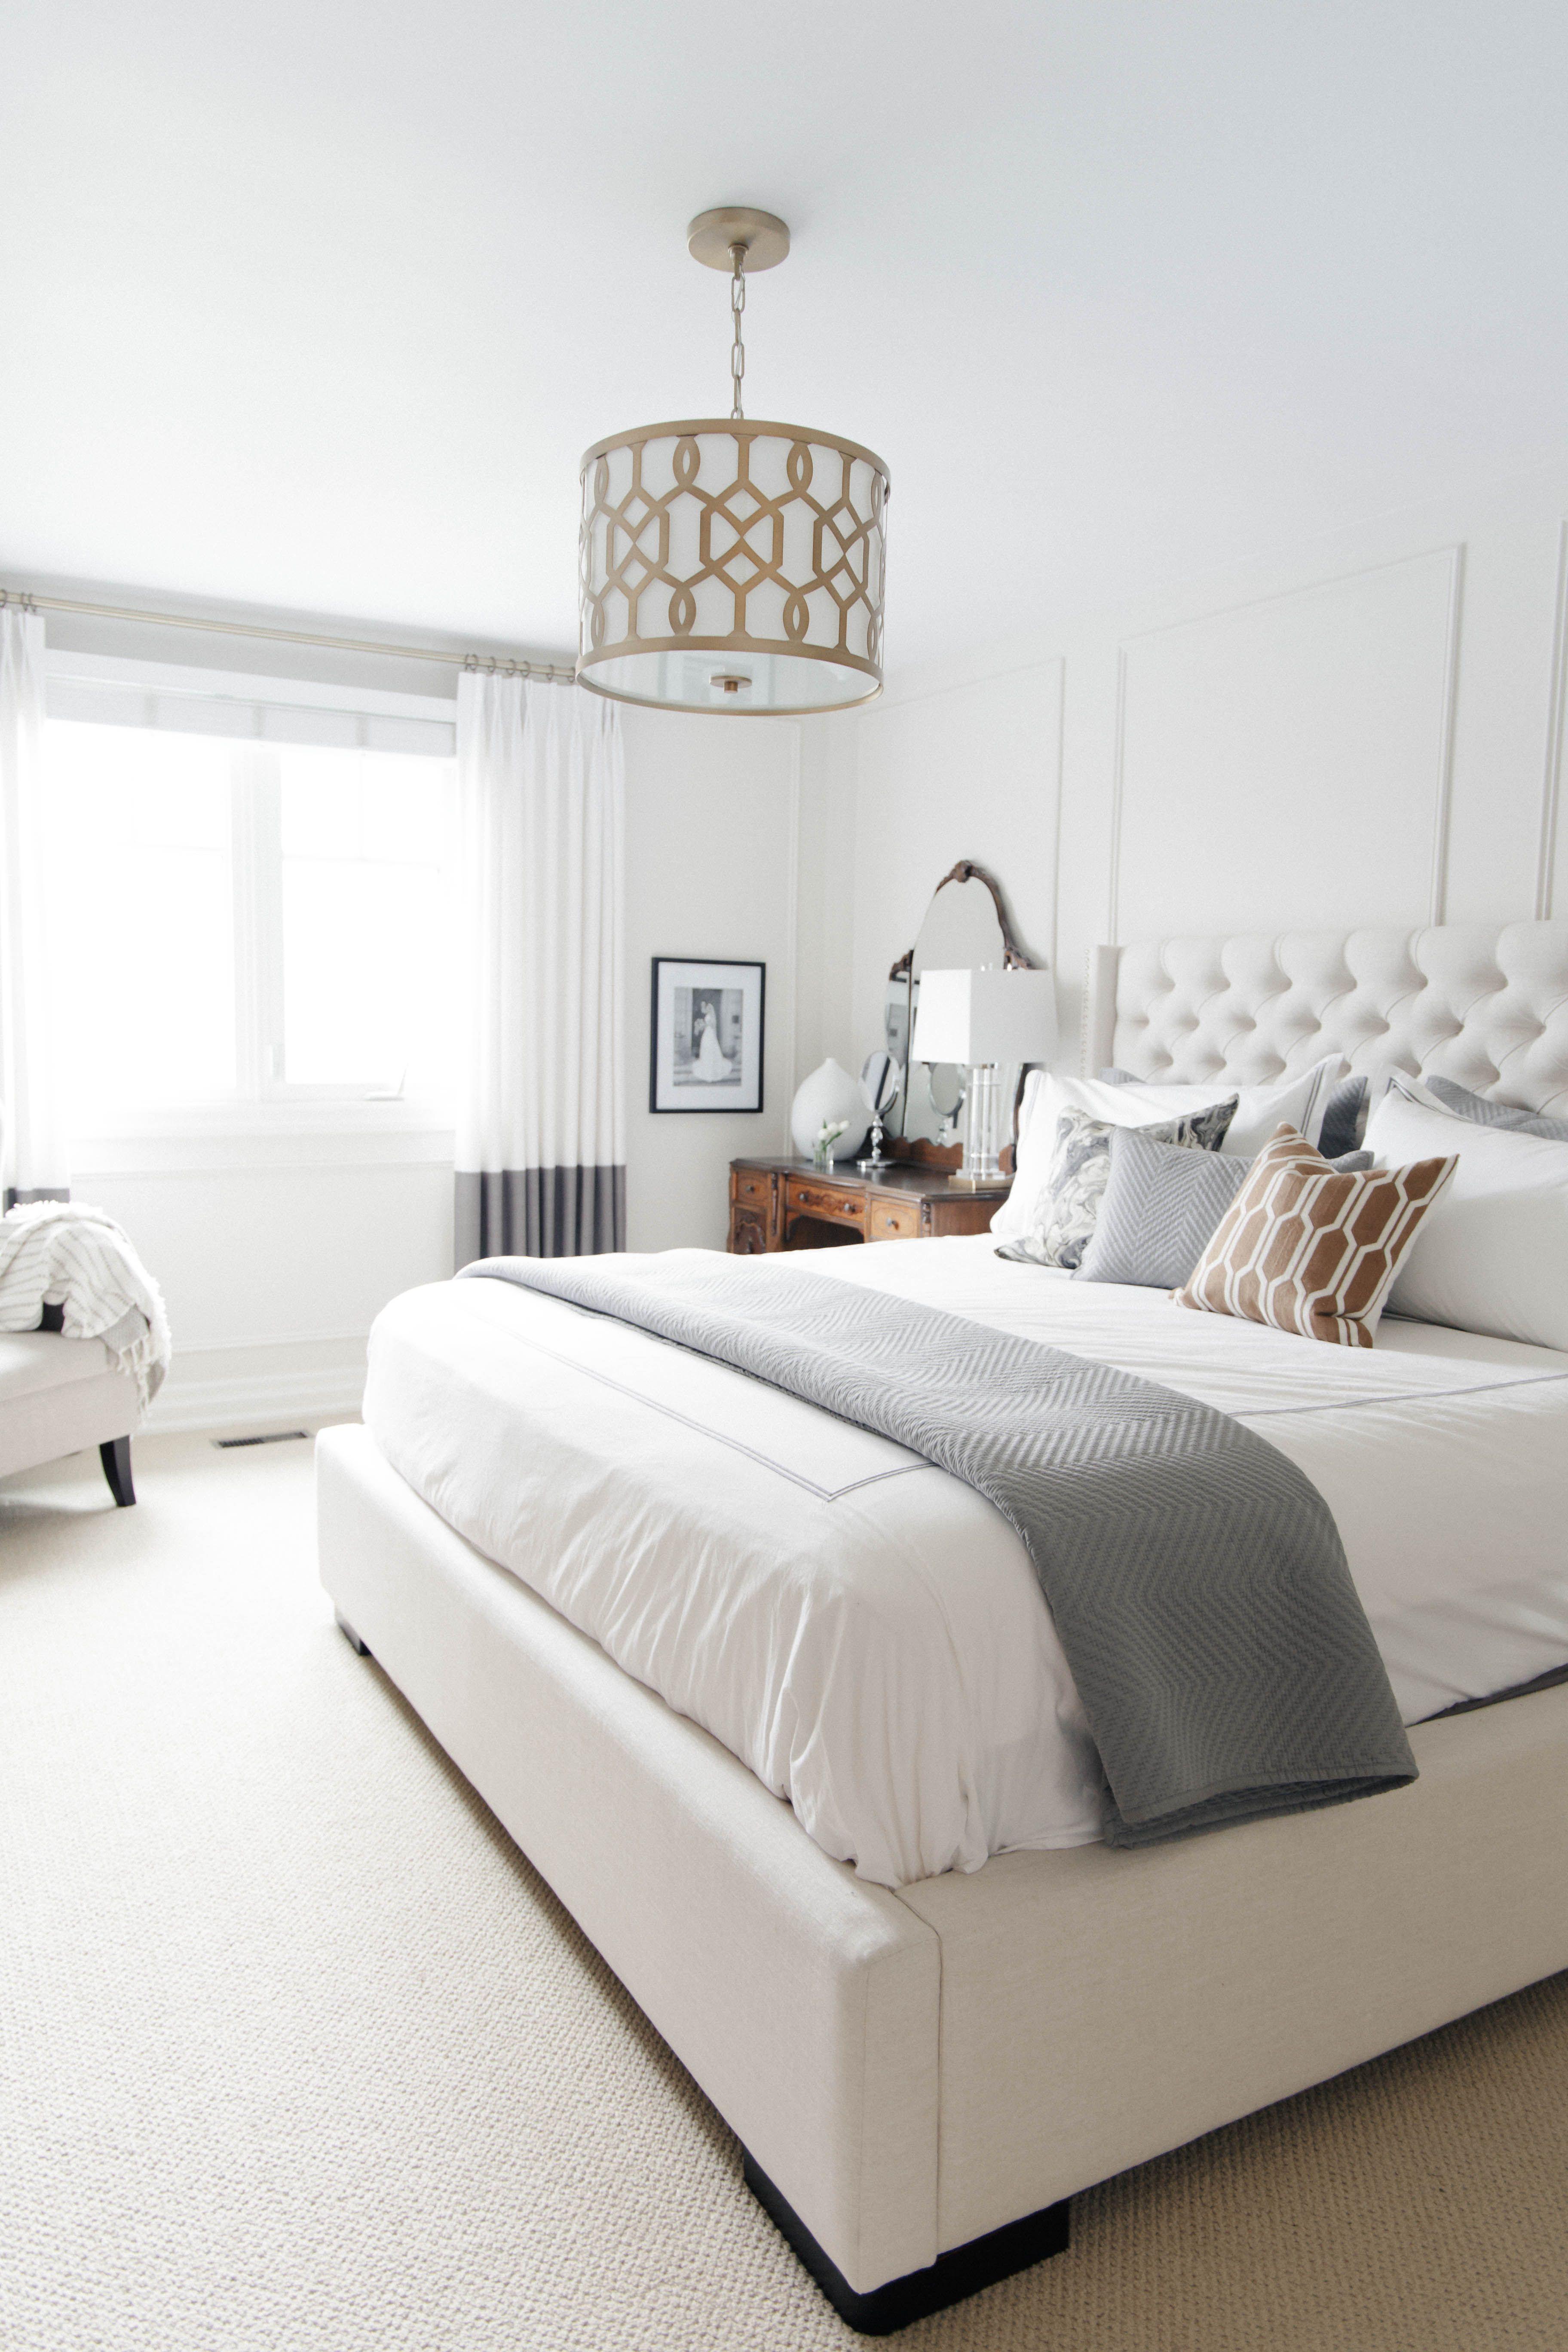 Master Bedroom With Antique Furniture Karin Bennett Designs Interior Furniture Interior Design